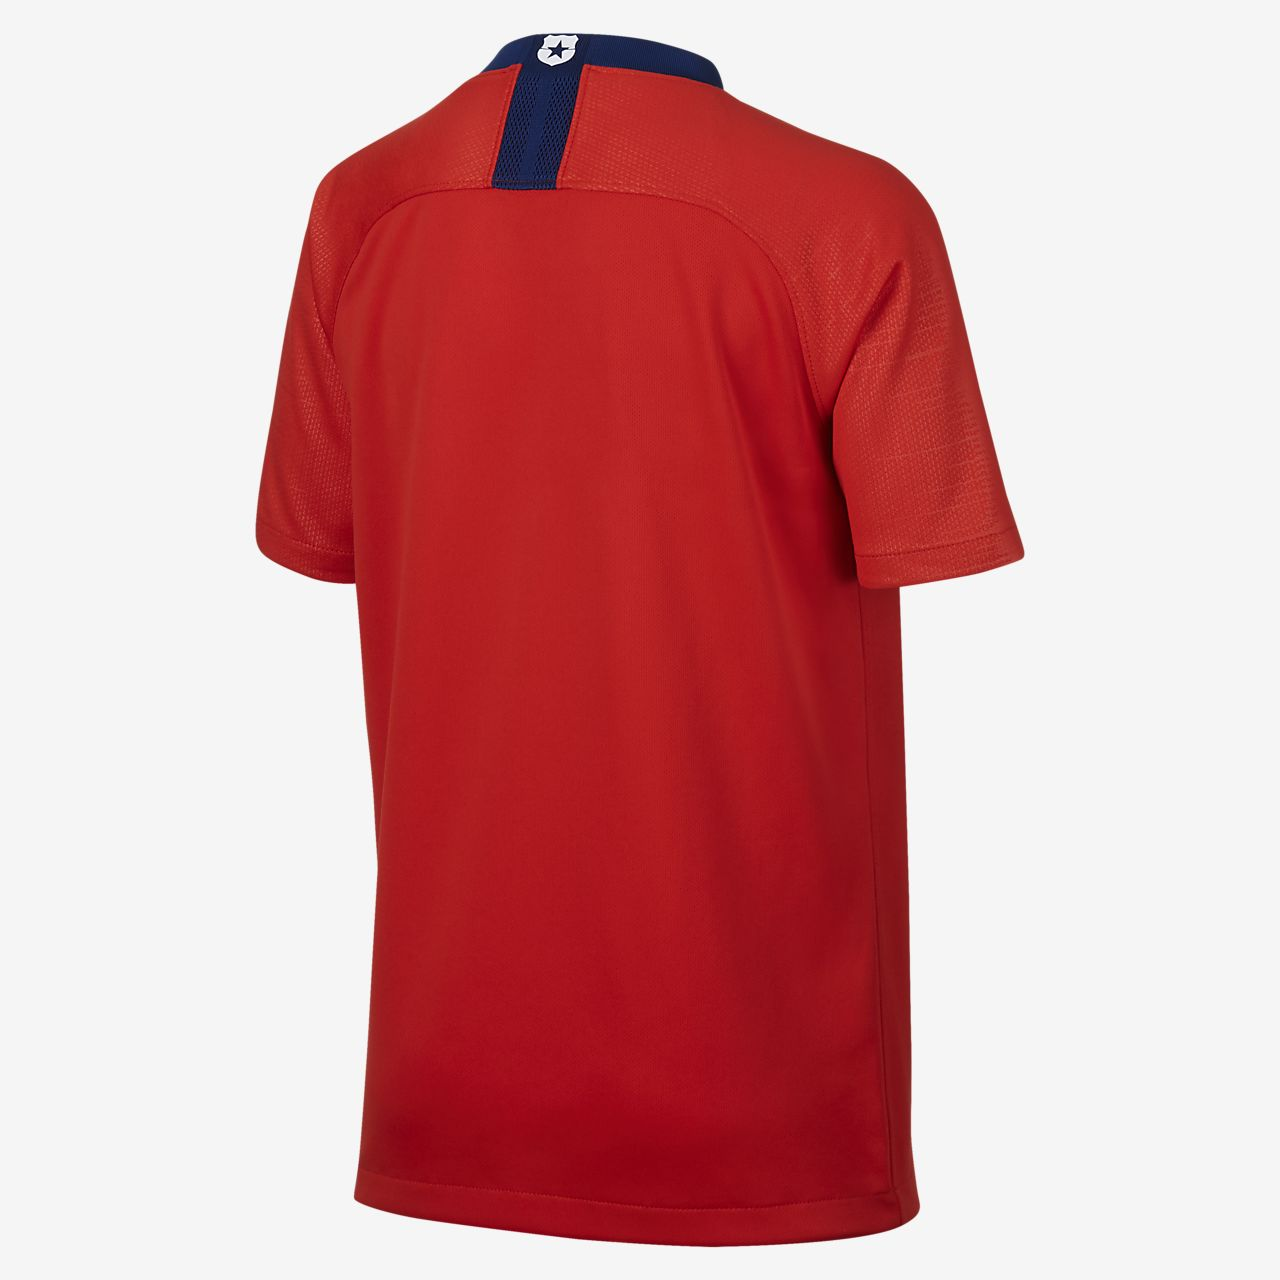 9b7b5a922 Camiseta de fútbol para niño talla grande 2018 Chile Stadium Home ...